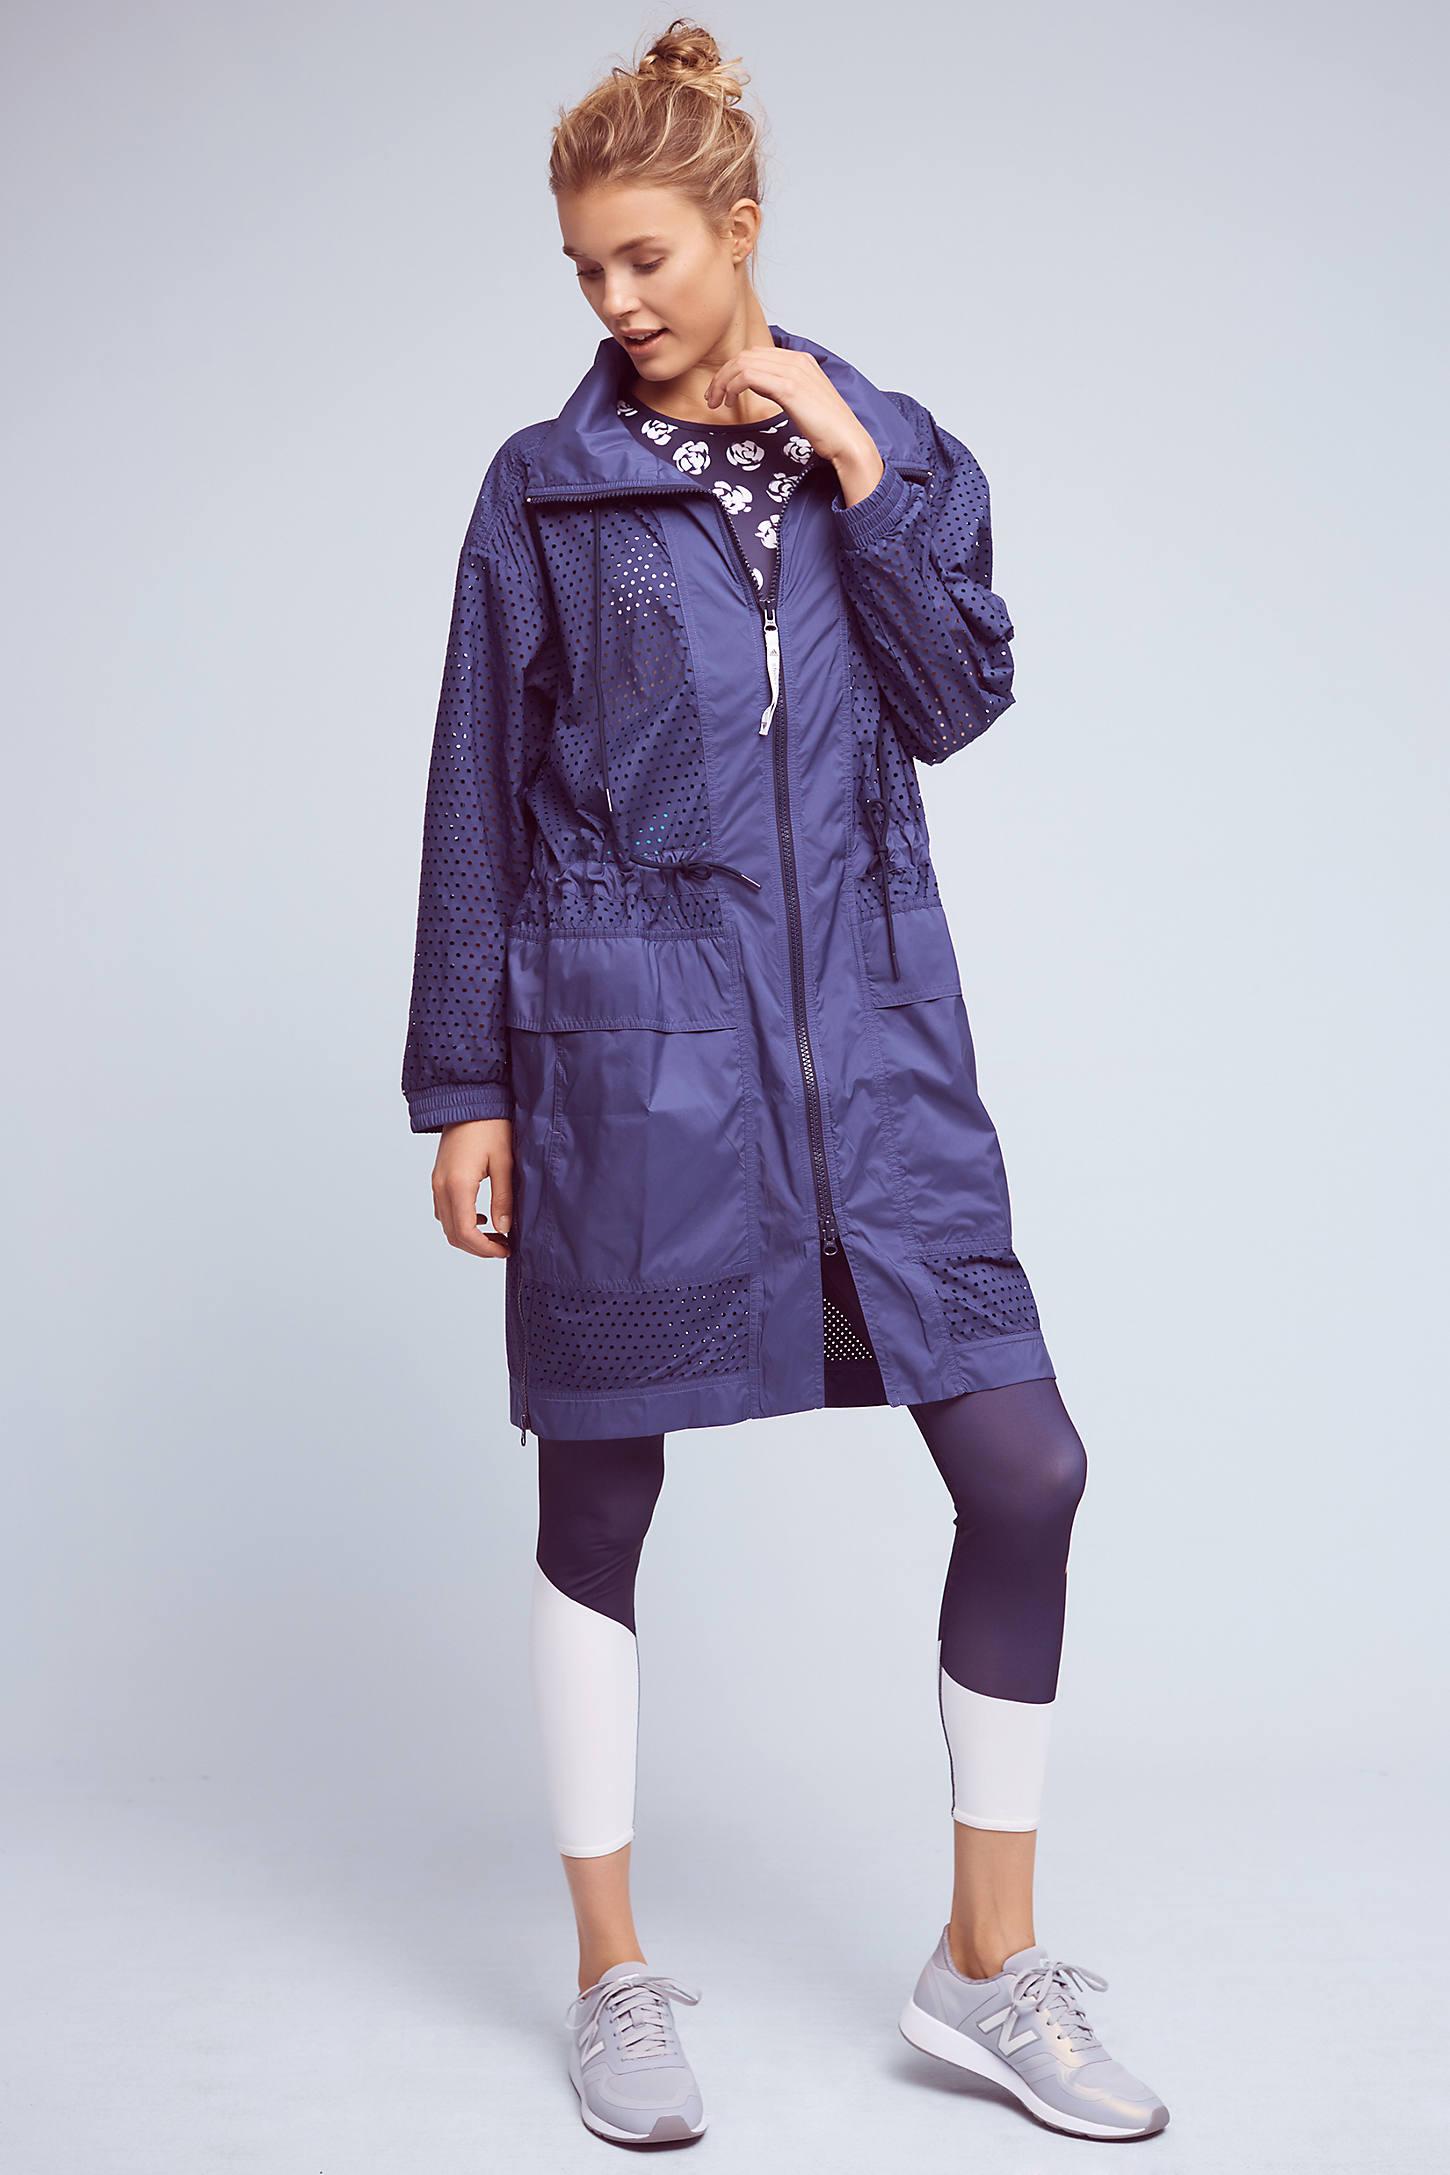 Adidas by Stella McCartney Florablocked Runner's Leggings